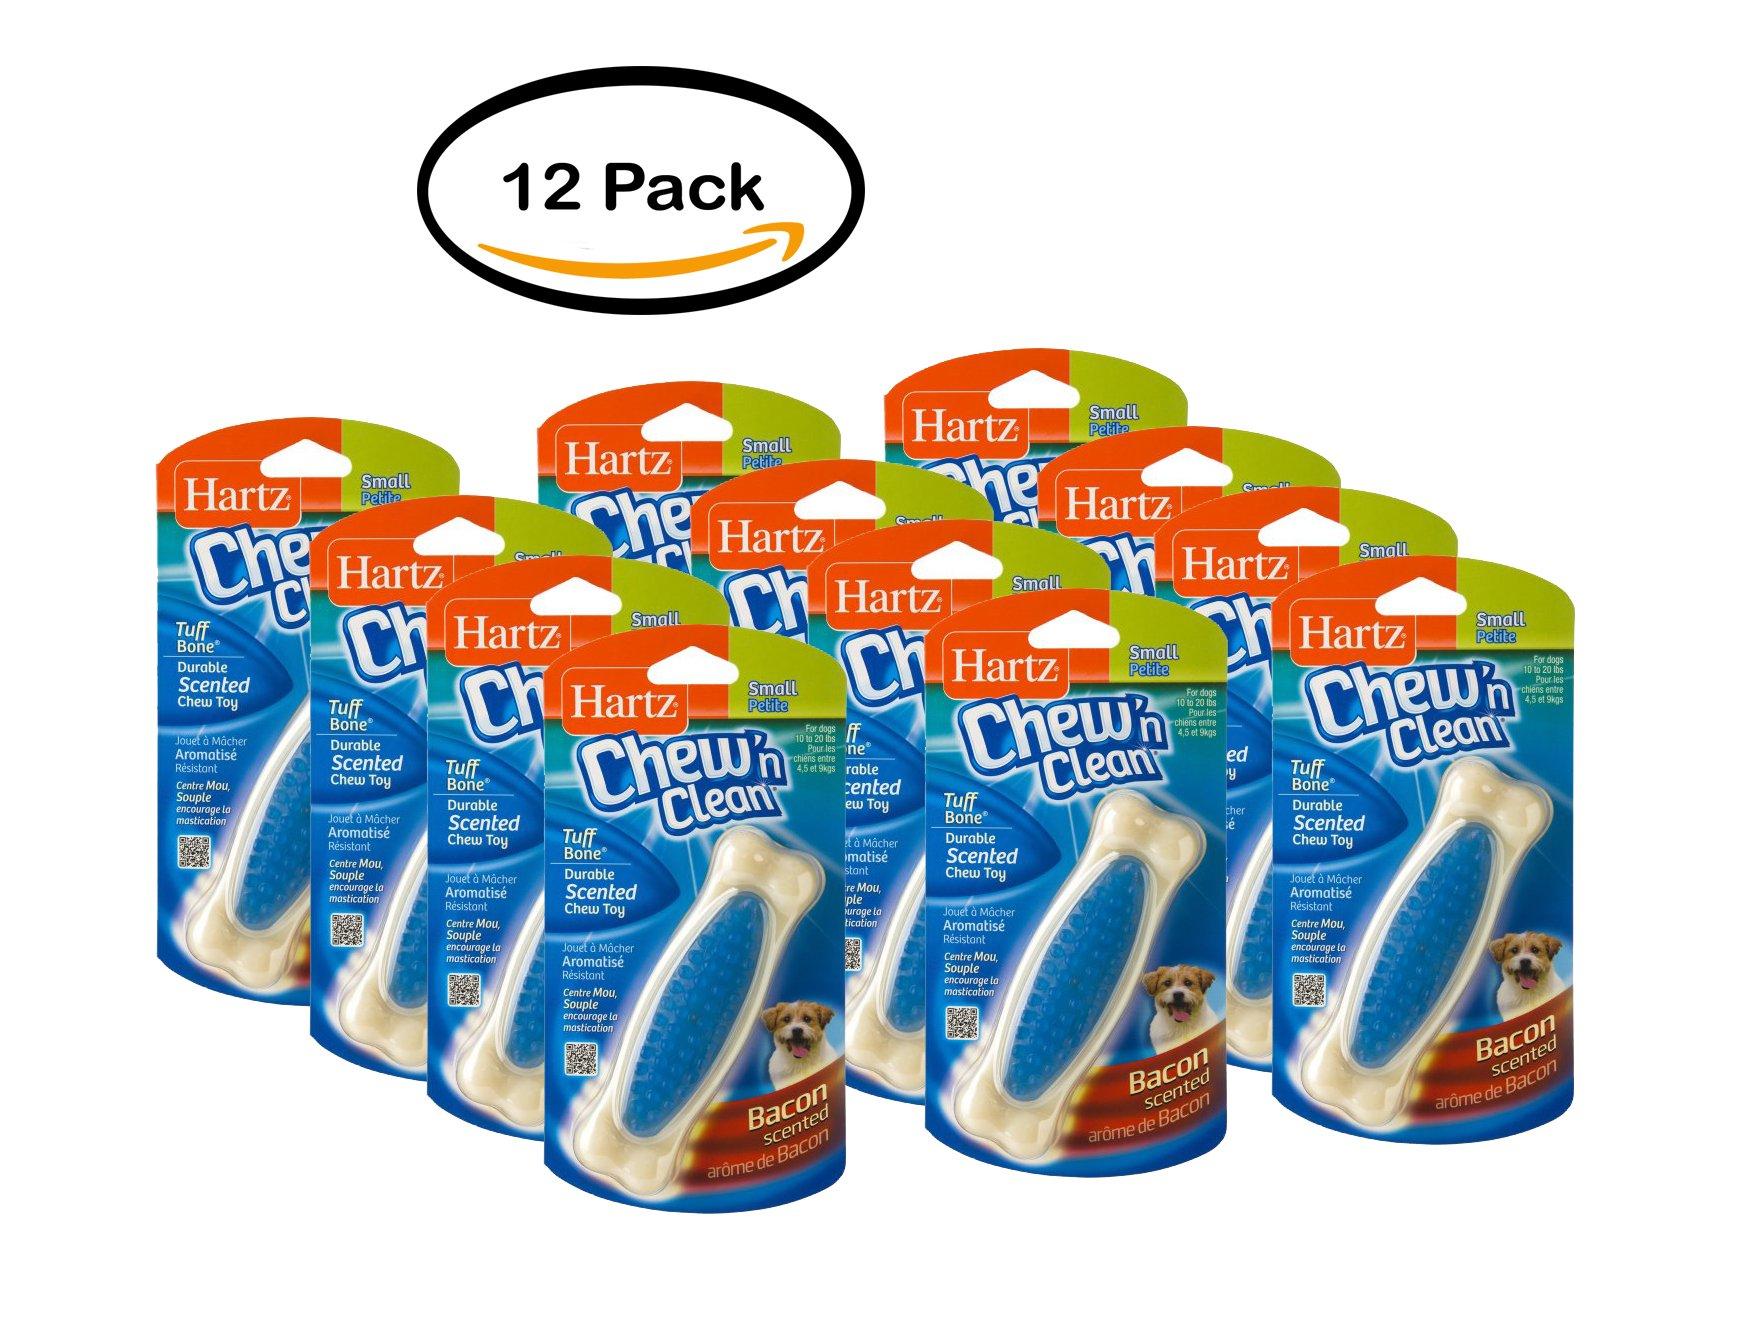 PACK OF 12 - Hartz: Chew 'n Clean Small Nylon Bone Chicken Flavor Dog Toy, 1.9 Oz